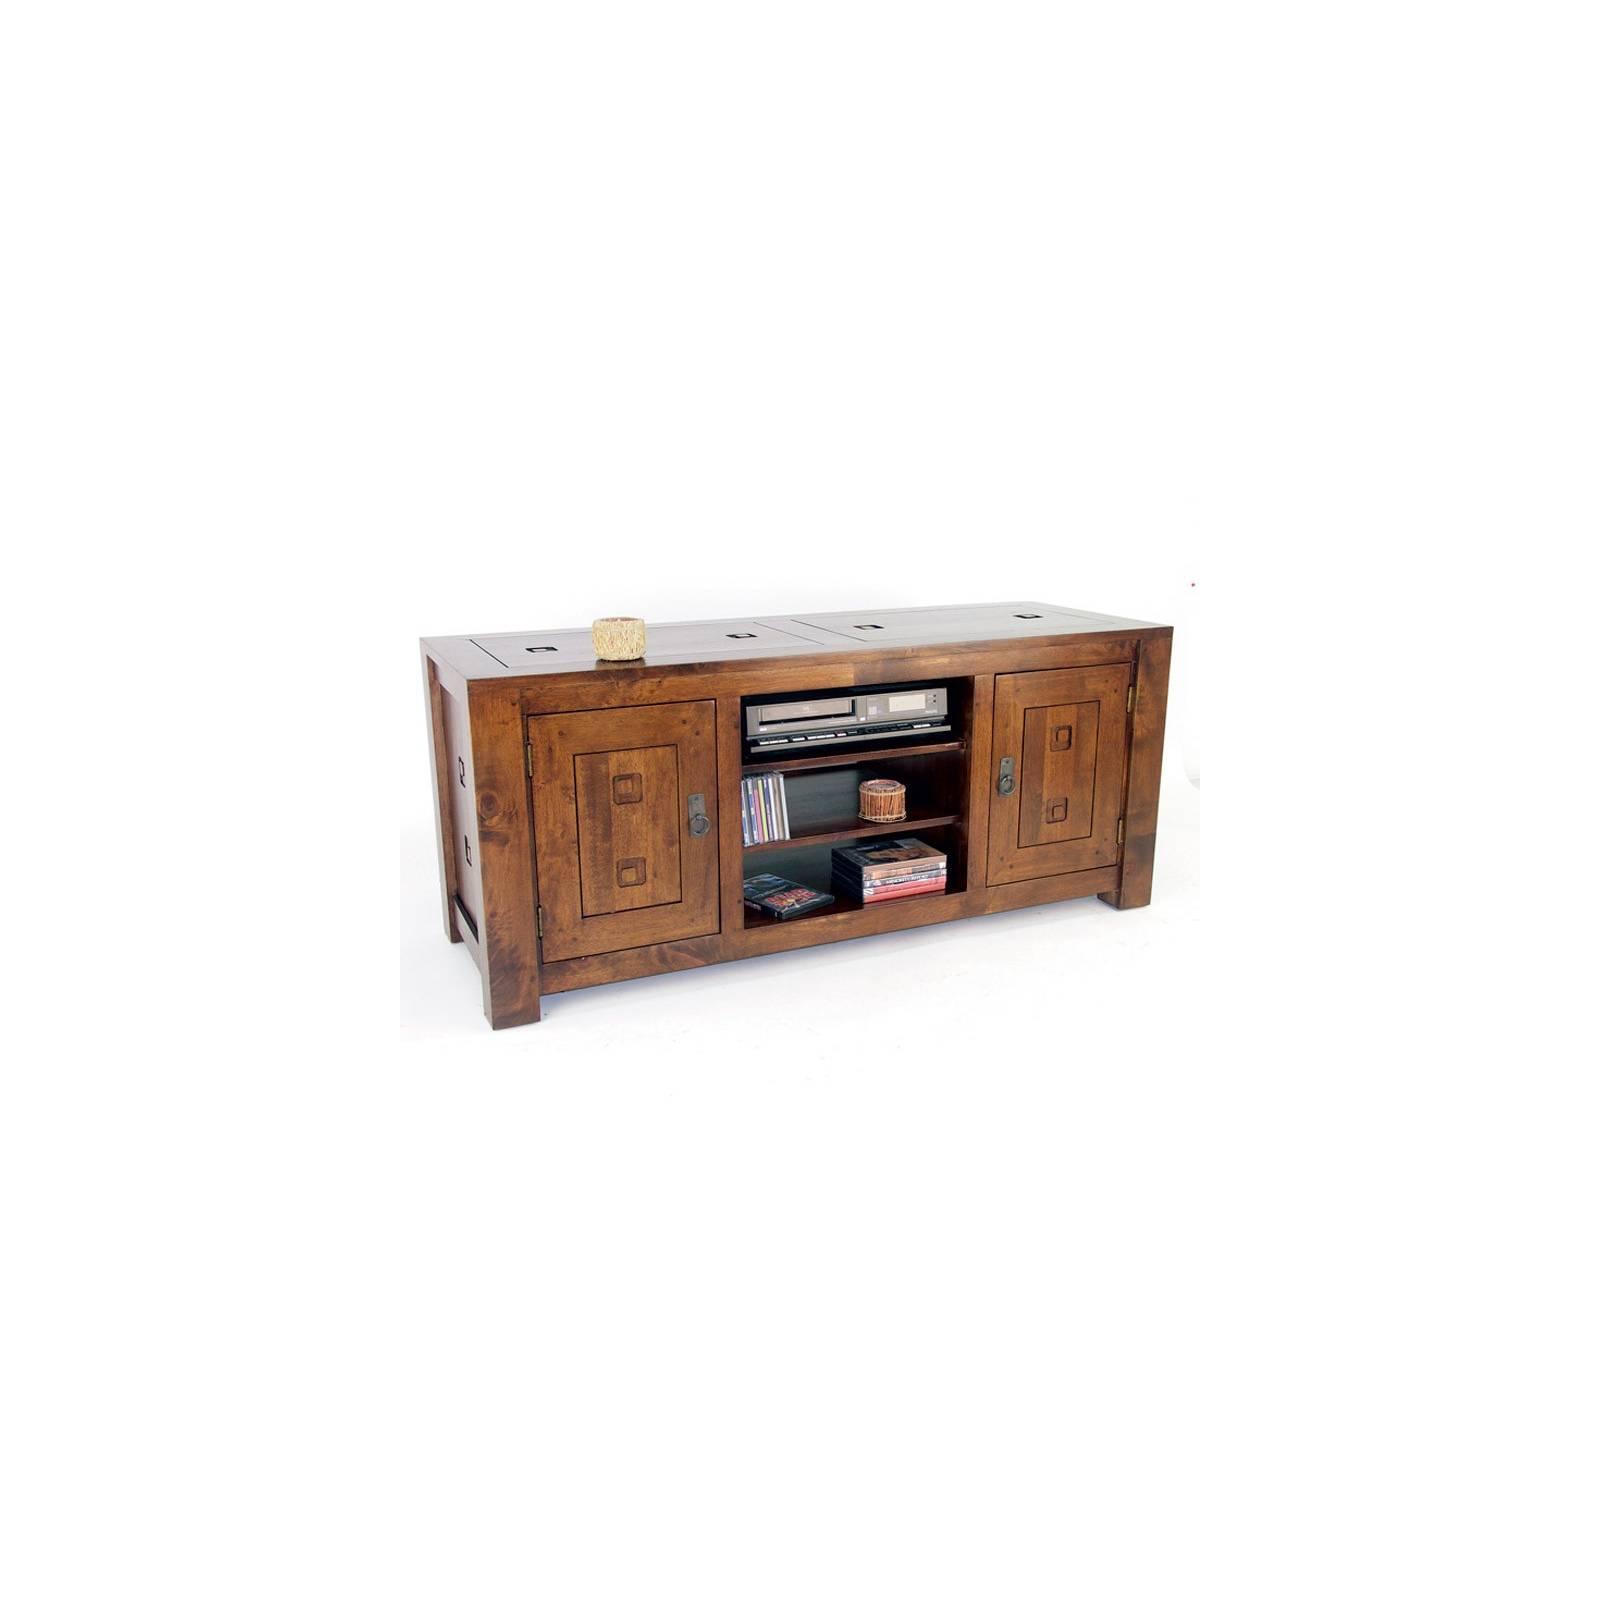 Meuble Tv Hifi Tanoa Hévéa - mobilier bois massif